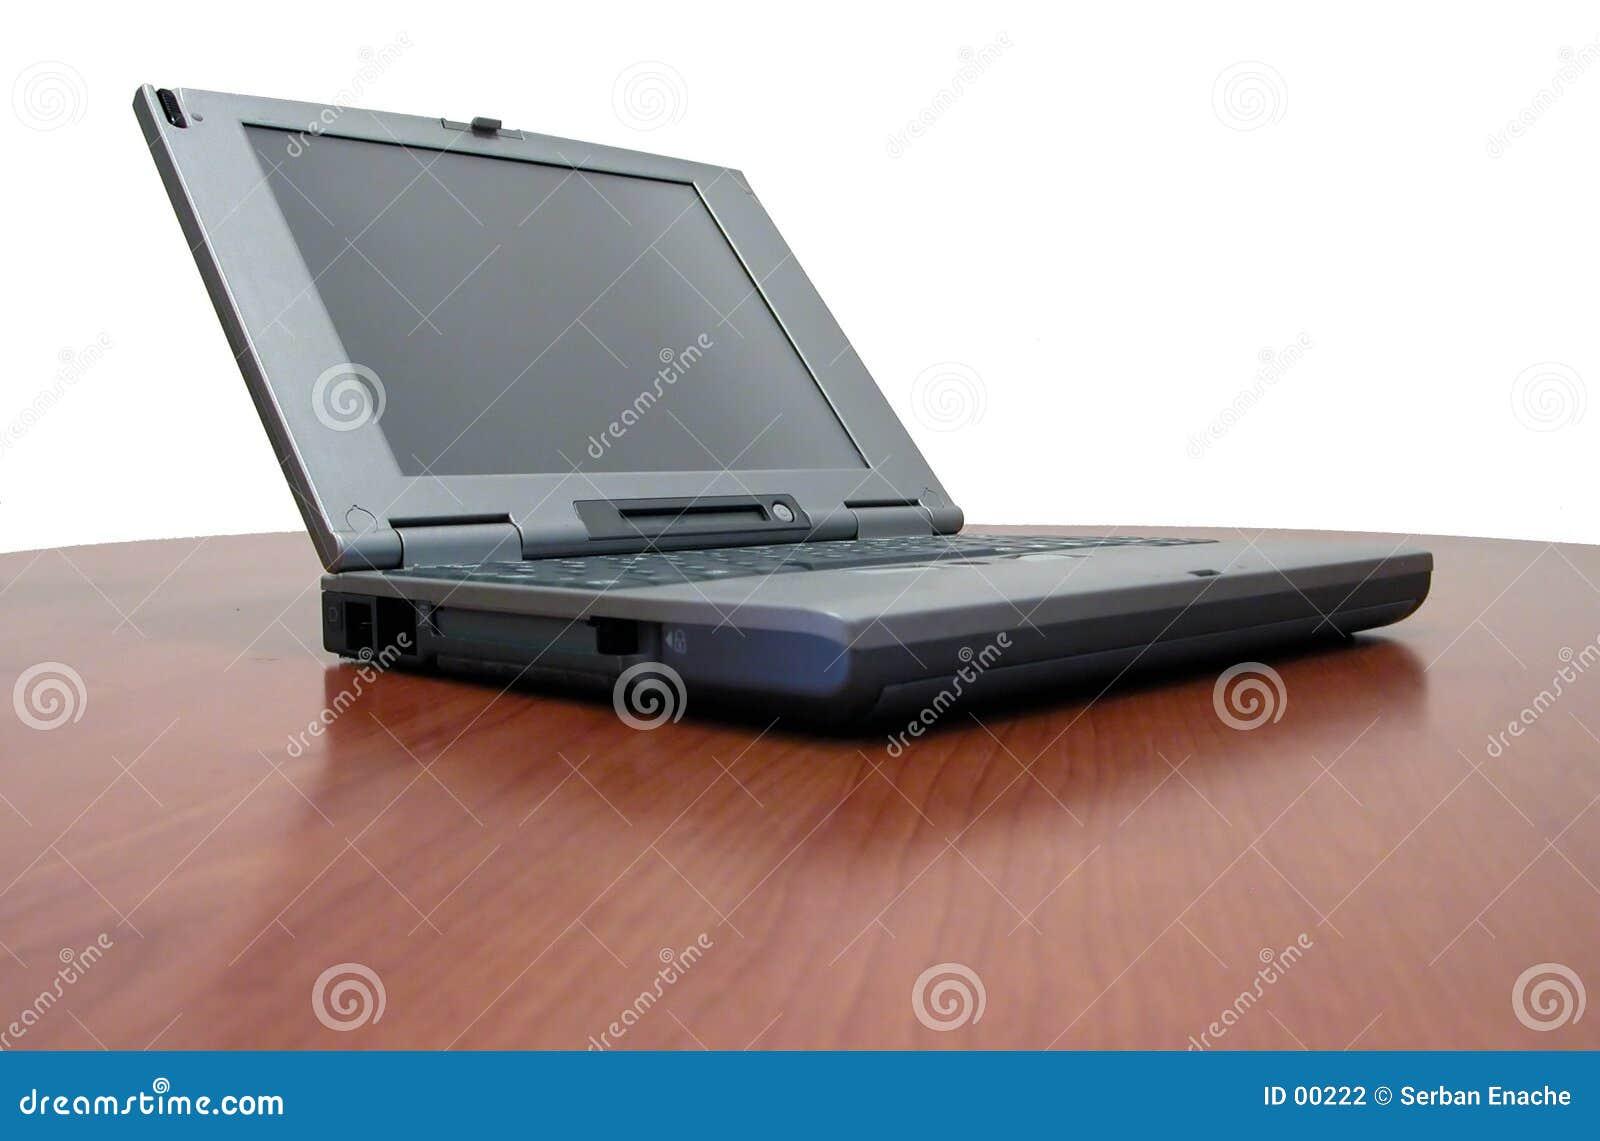 Cherryskrivbordbärbar dator